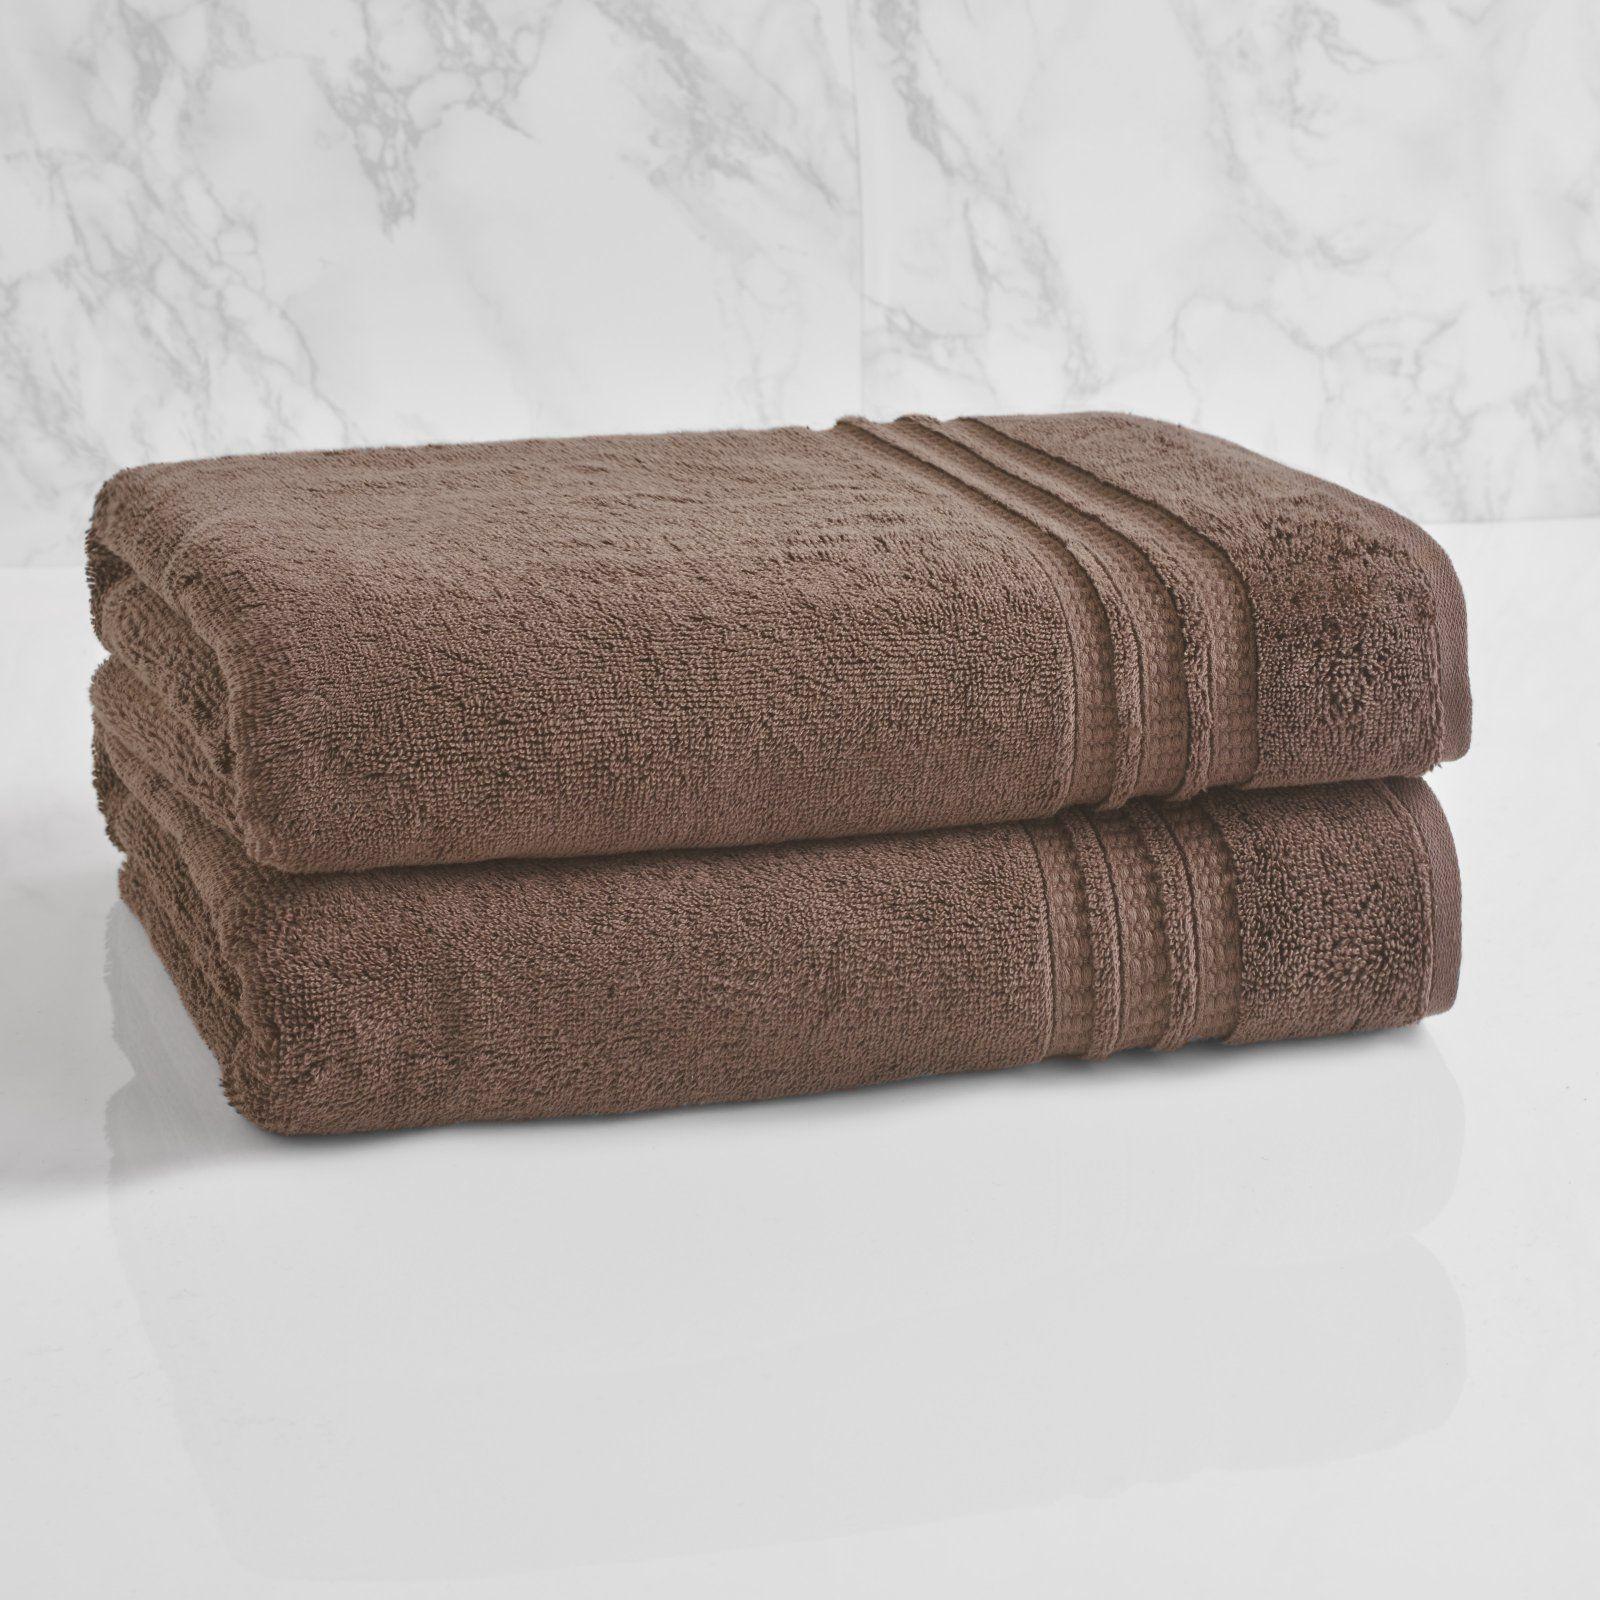 Loft By Loftex Essentials Solid Cotton Bath Towel Plum Truffle